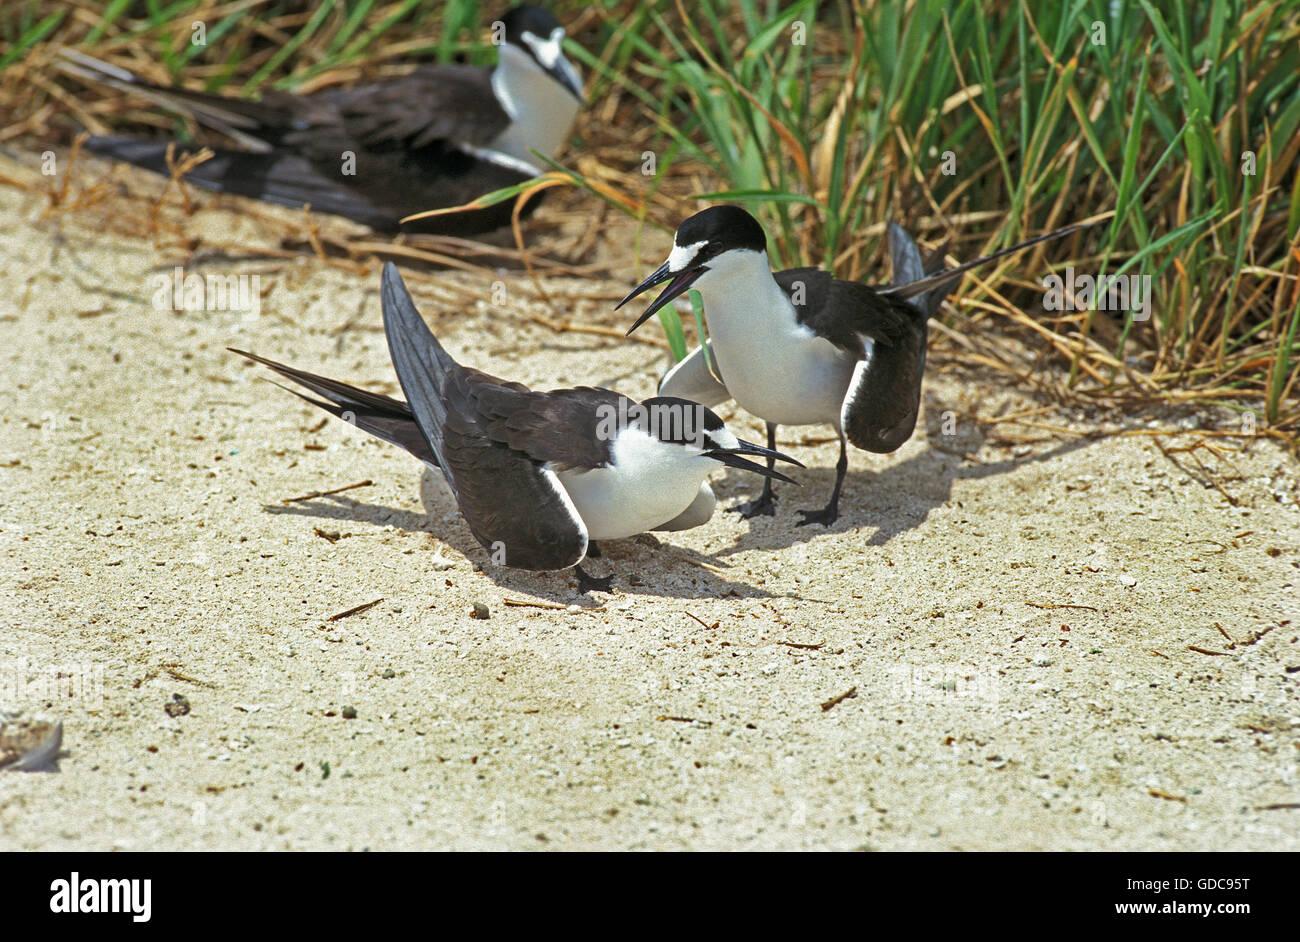 Sooty Tern, sterna fuscata, Group, Australia Stock Photo